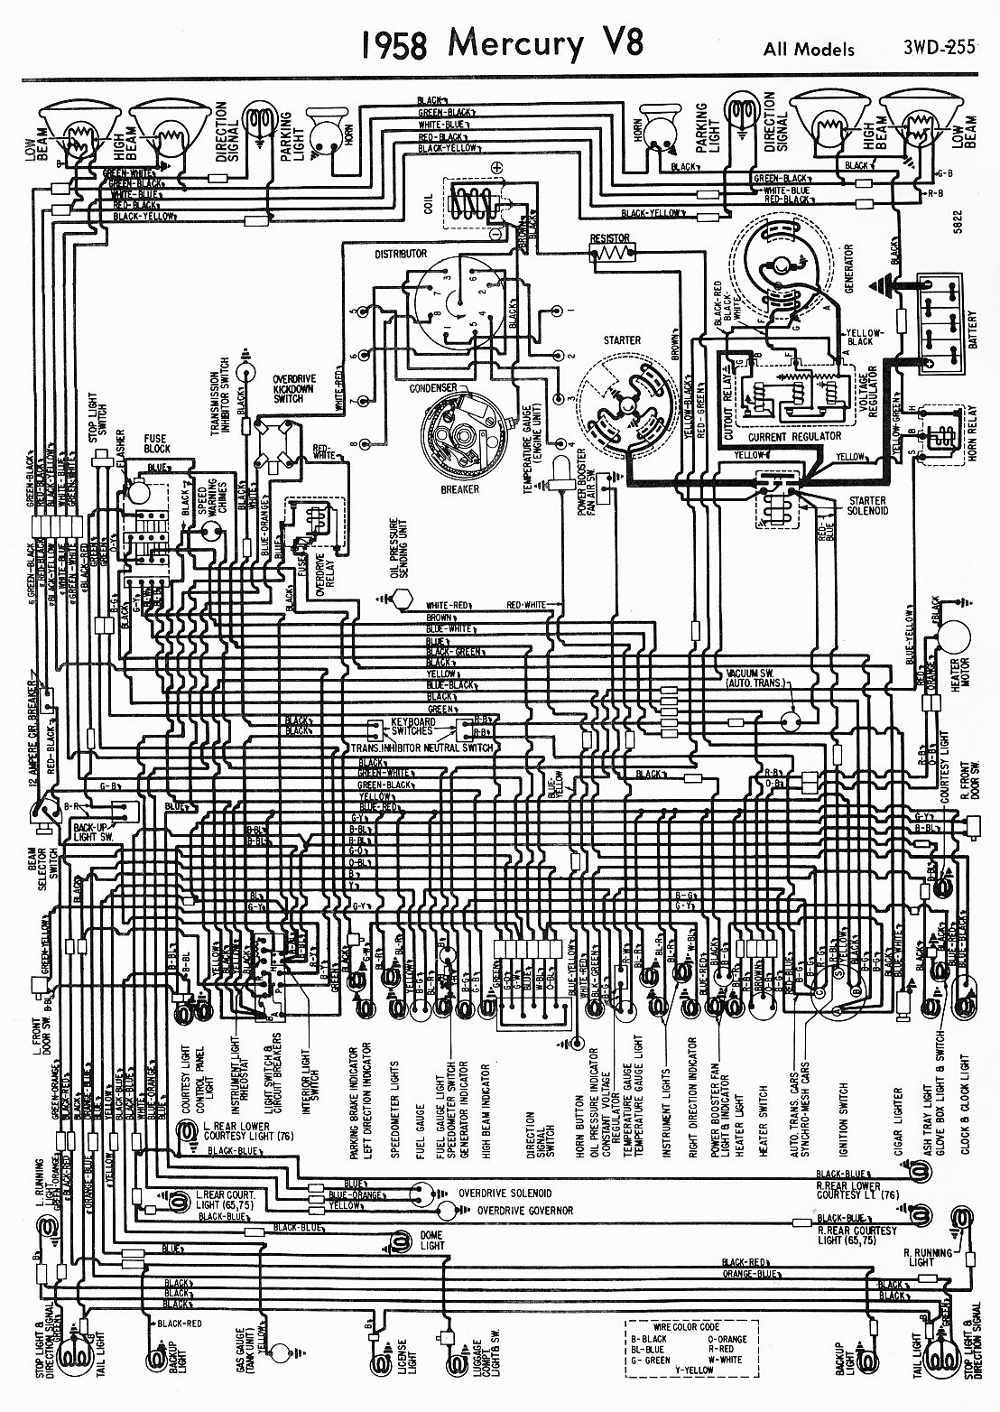 Wiring Diagrams 911: 1958 Mercury V8 All Models Wiring Diagram